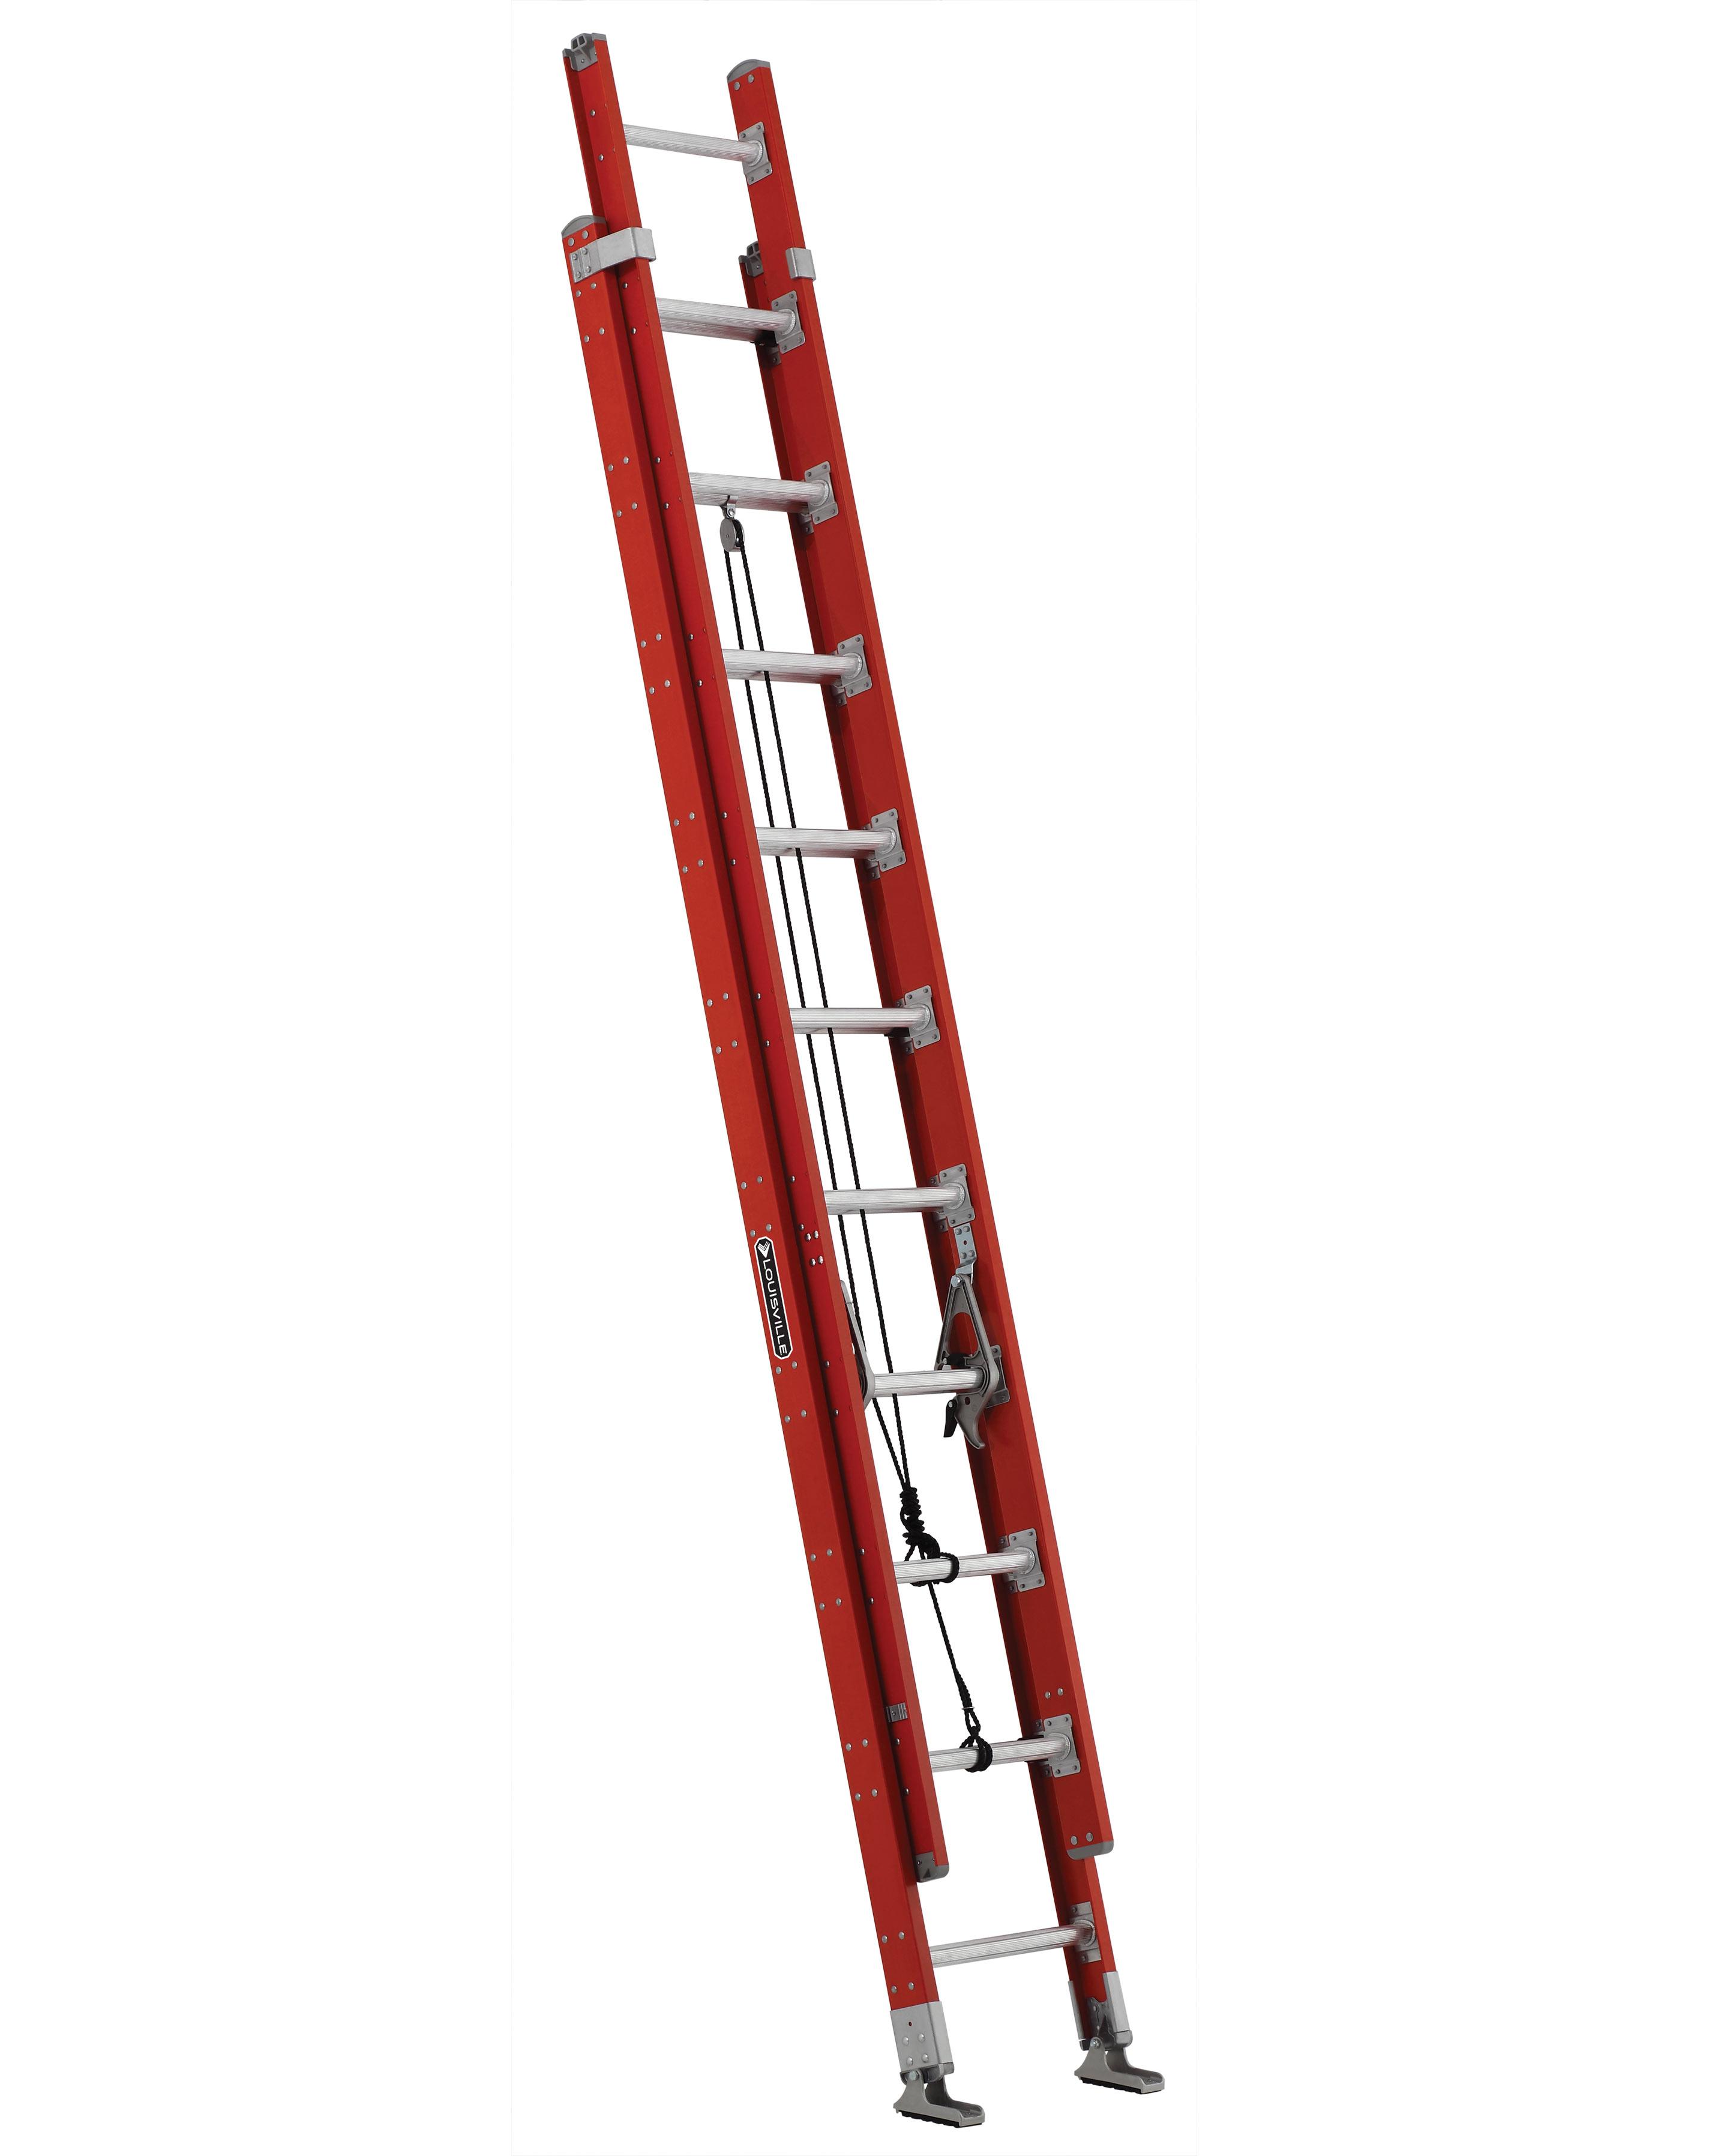 LOUISVILLE LADDERS 20 ft Fiberglass Multi-section Extension Ladders